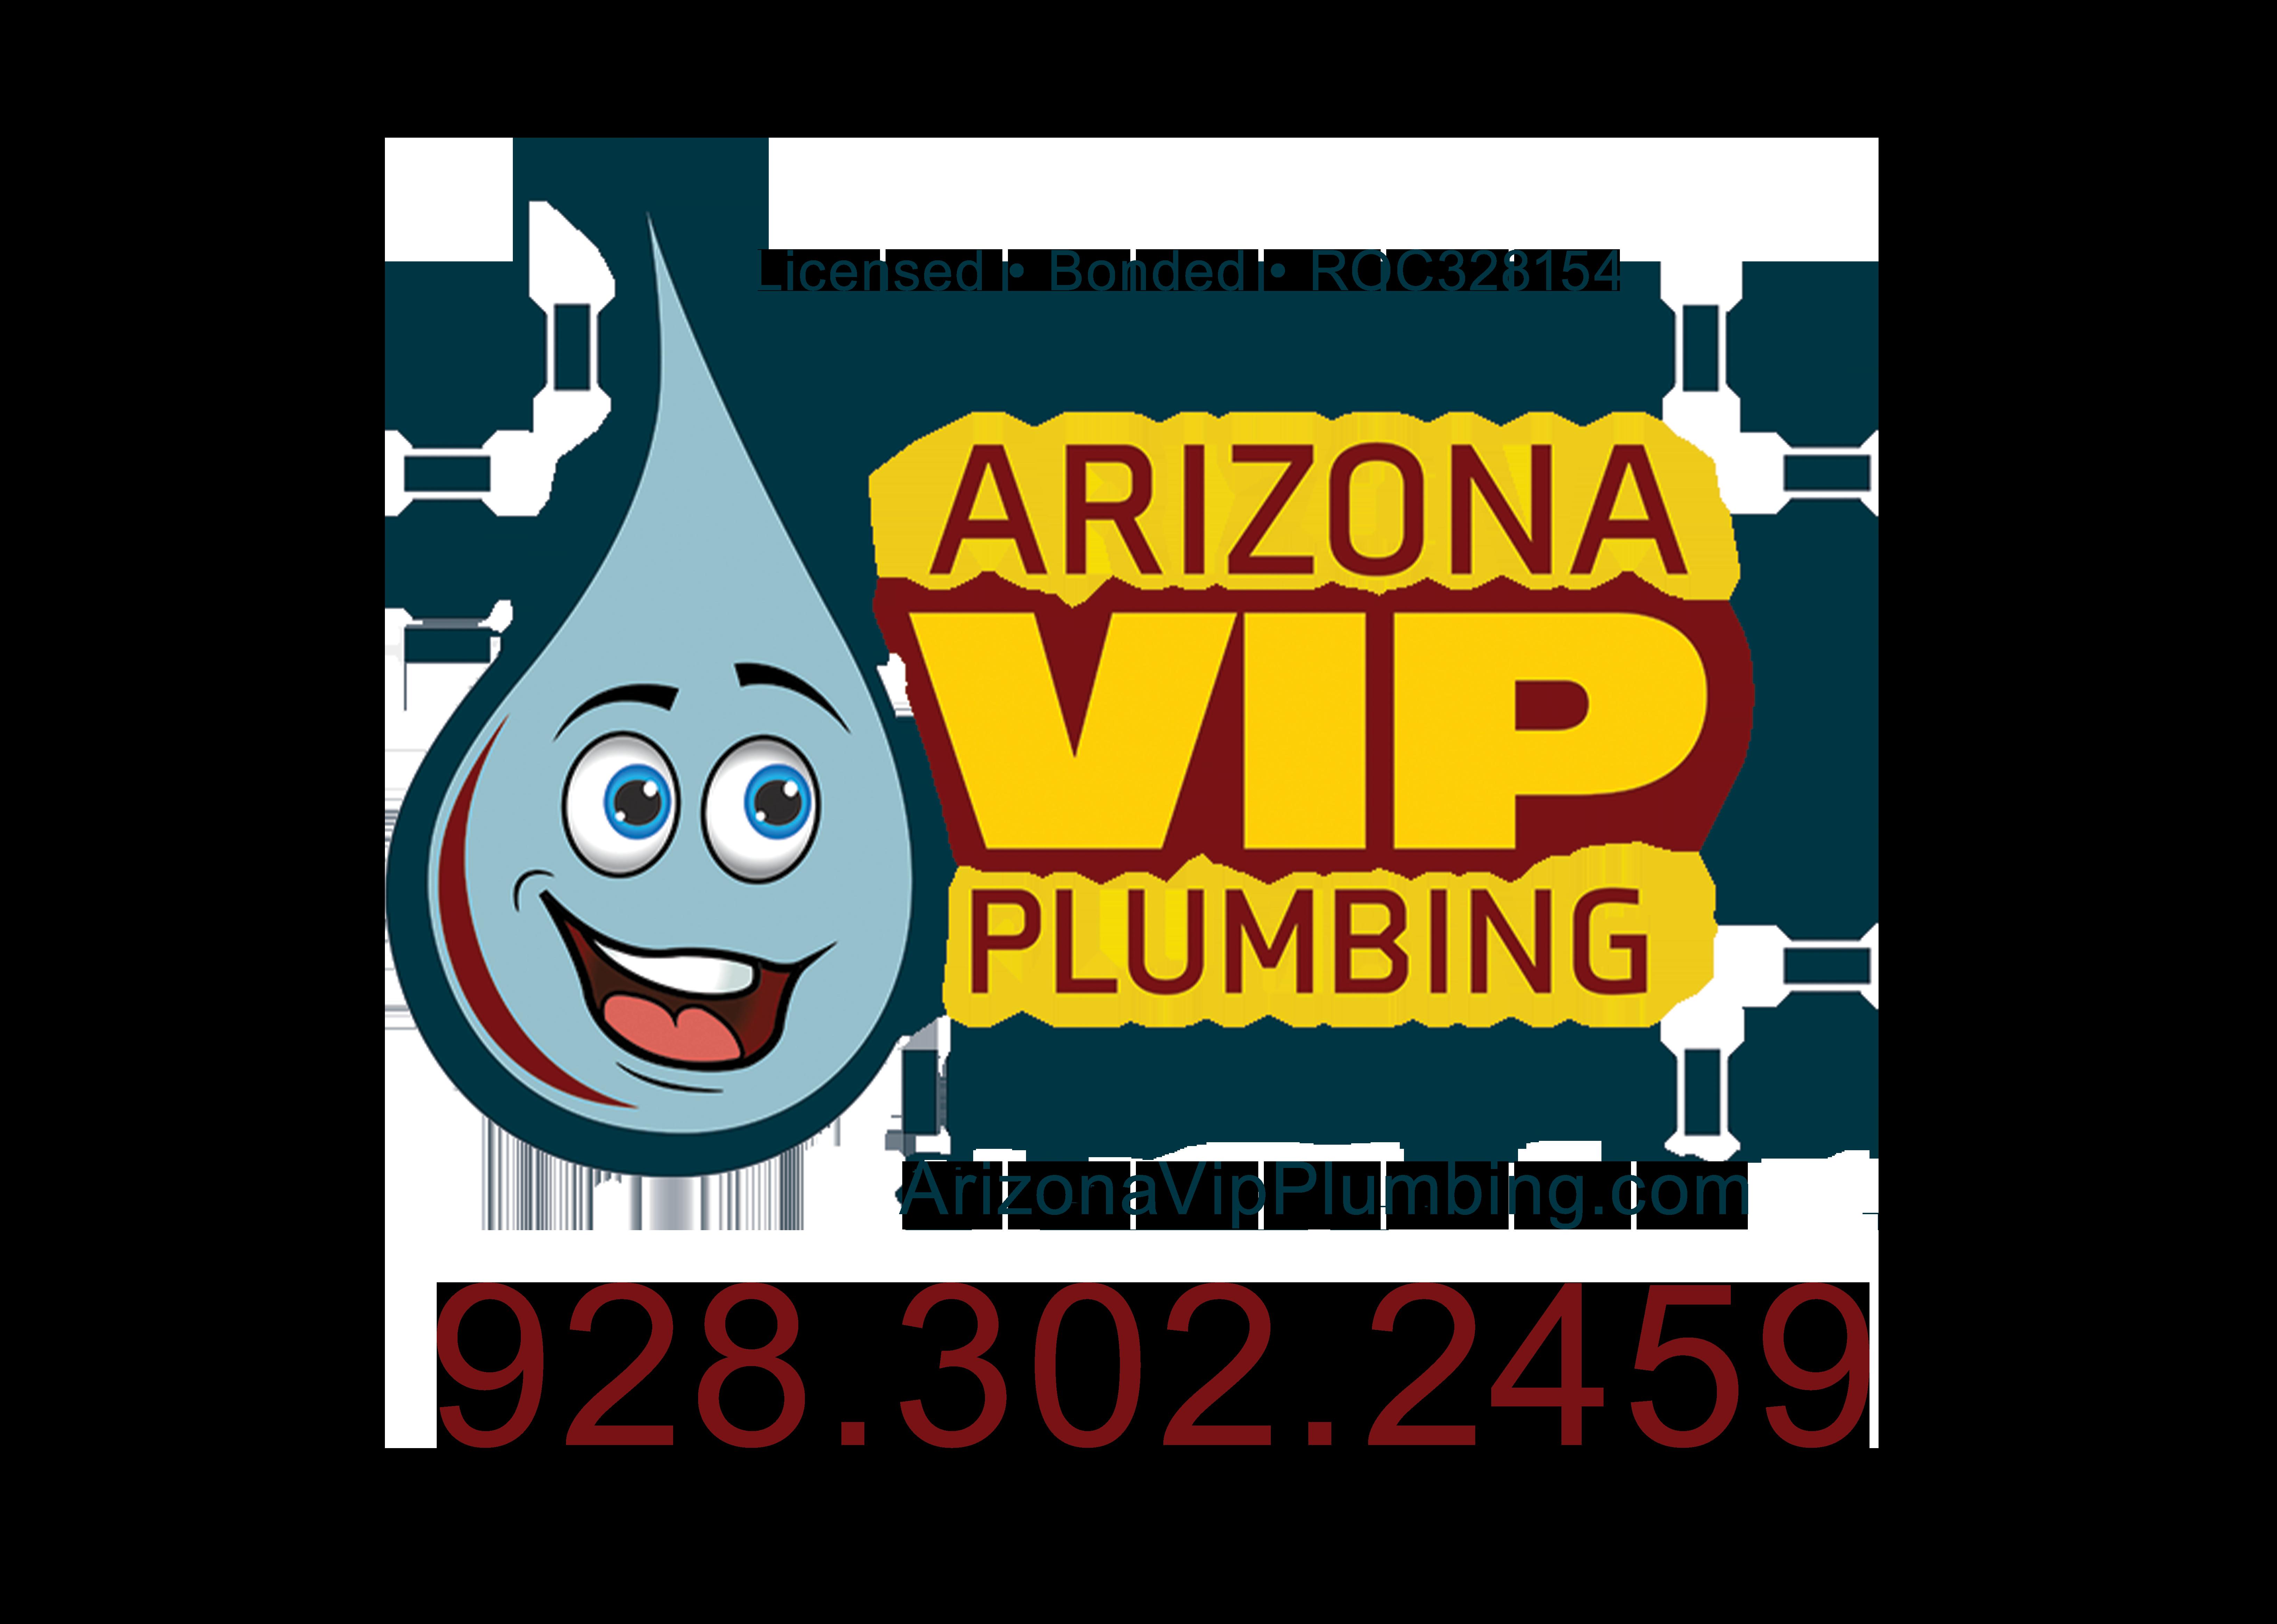 arizona vip plumbing